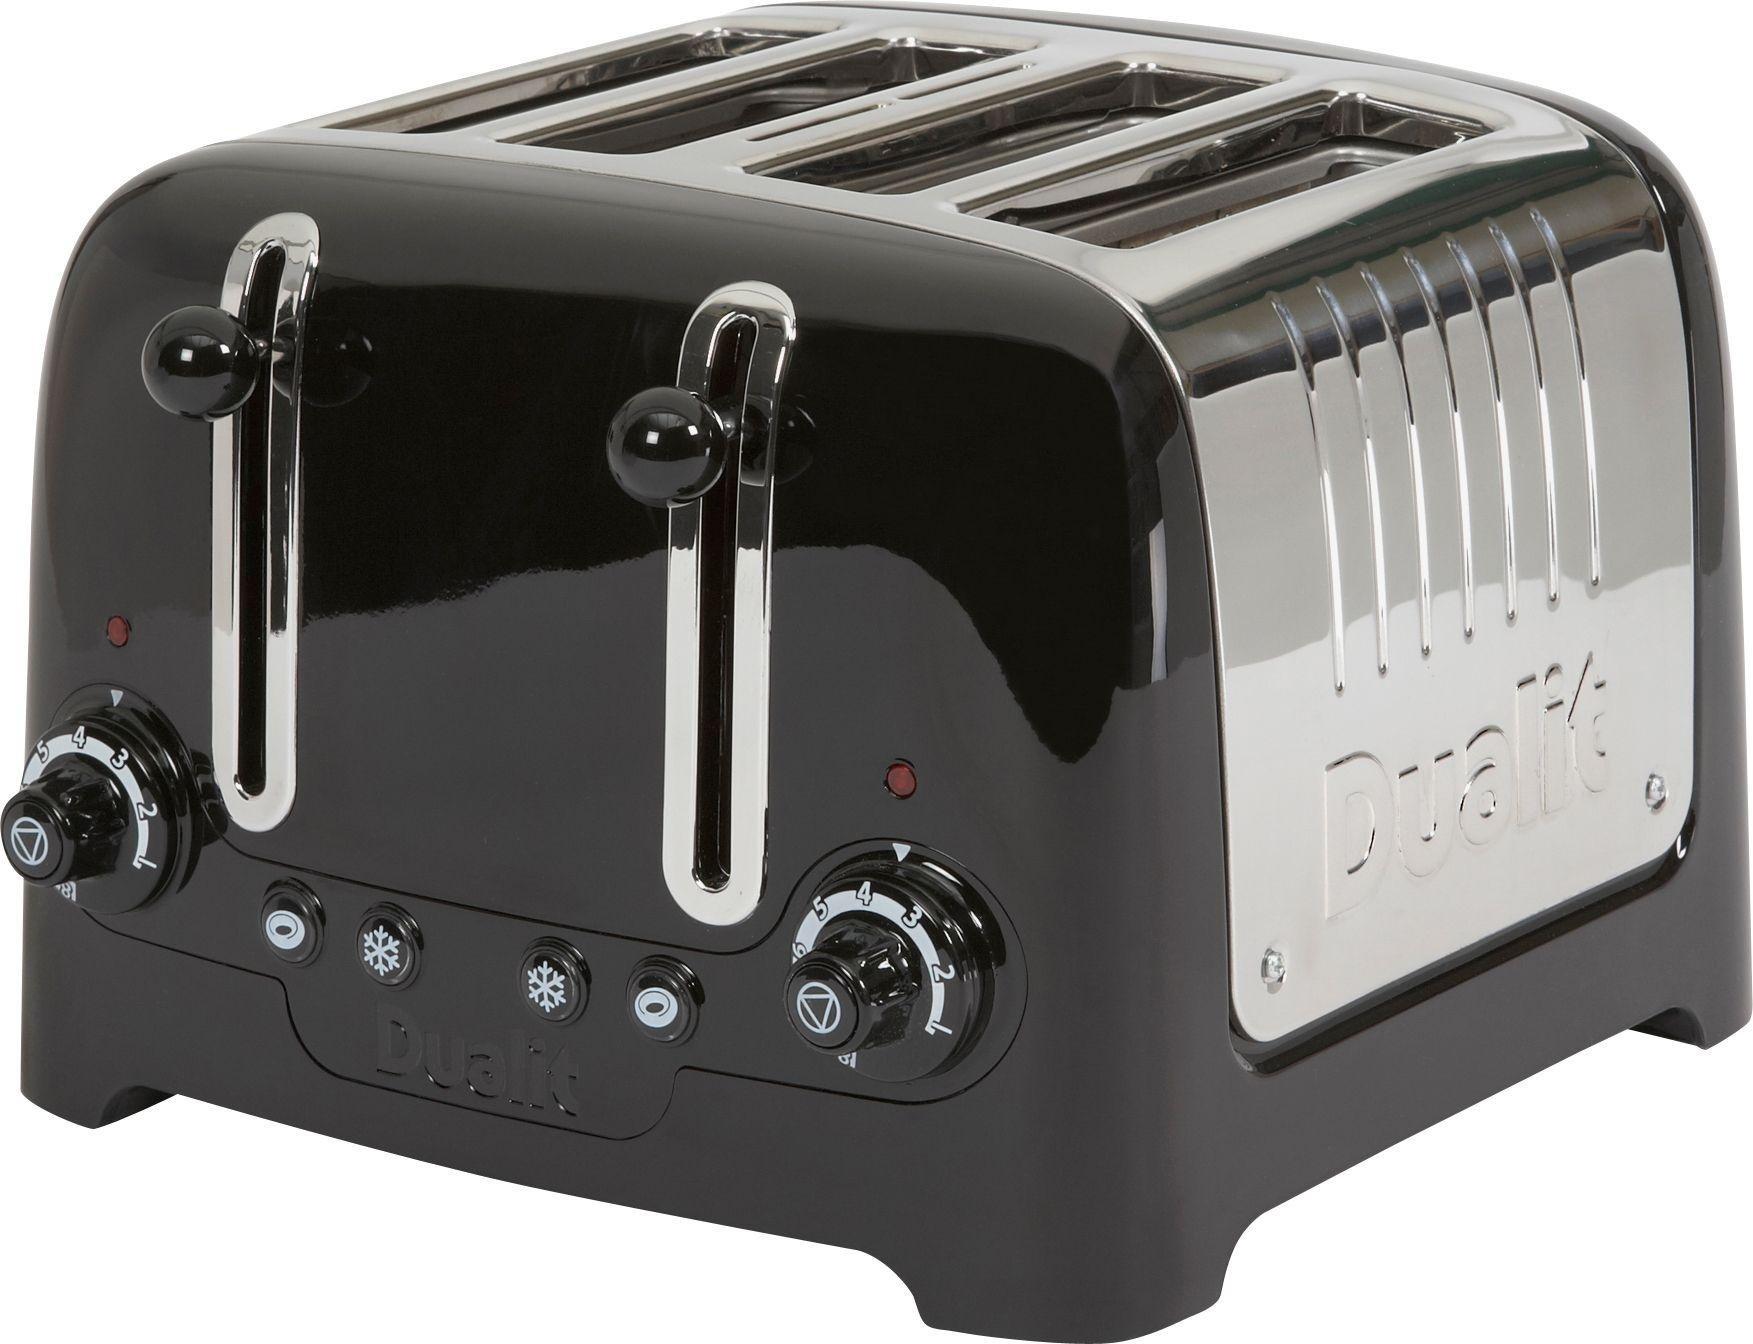 Buy Dualit DPP4 4 Slice Lite Toaster Black at Argos Your